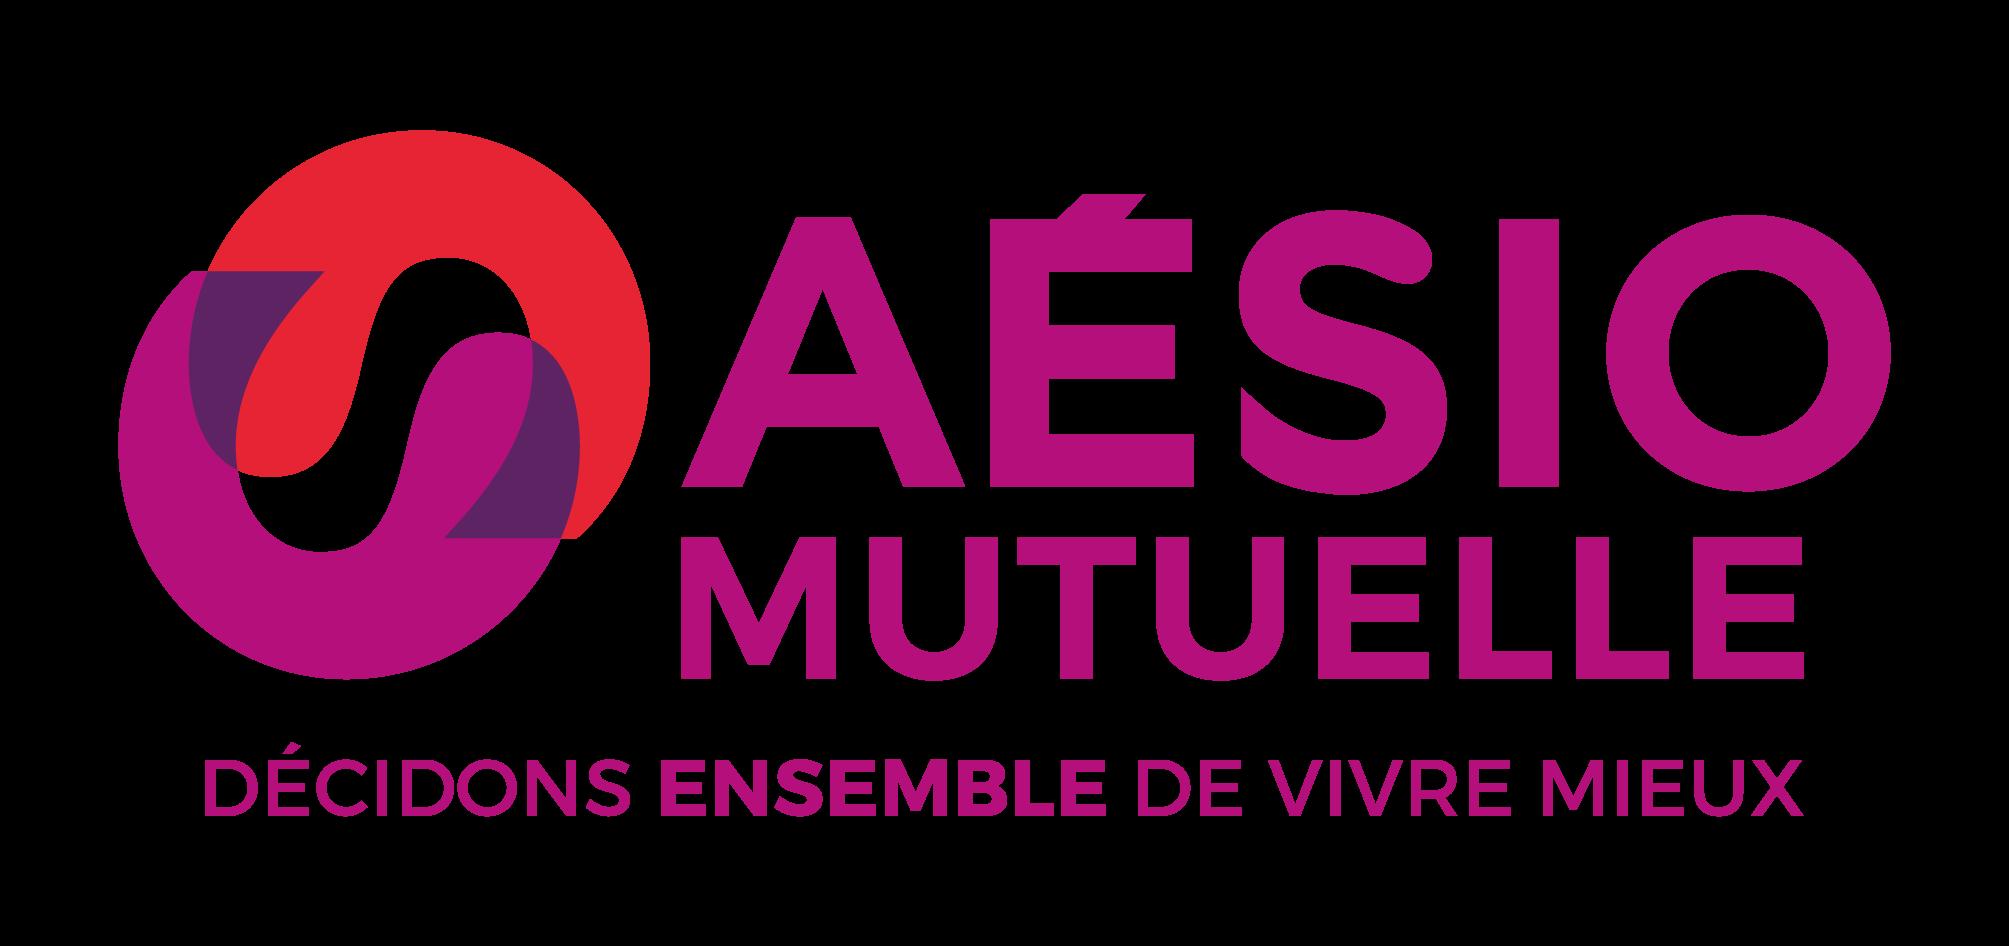 image Aesio mutuelle